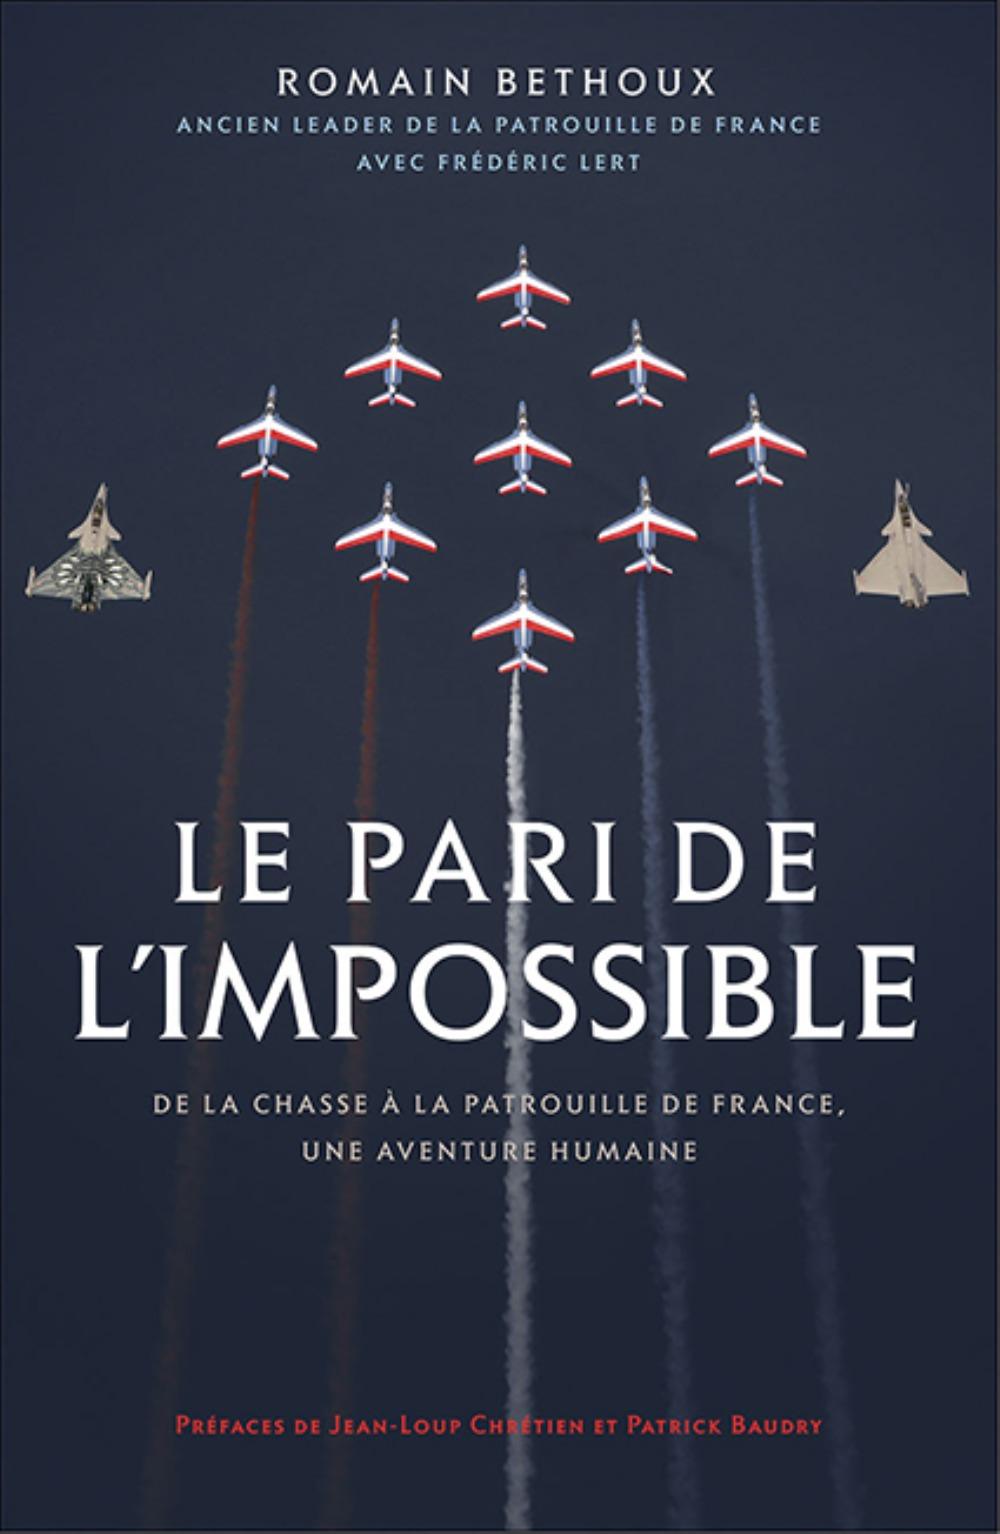 LE PARI DE L'IMPOSSIBLE